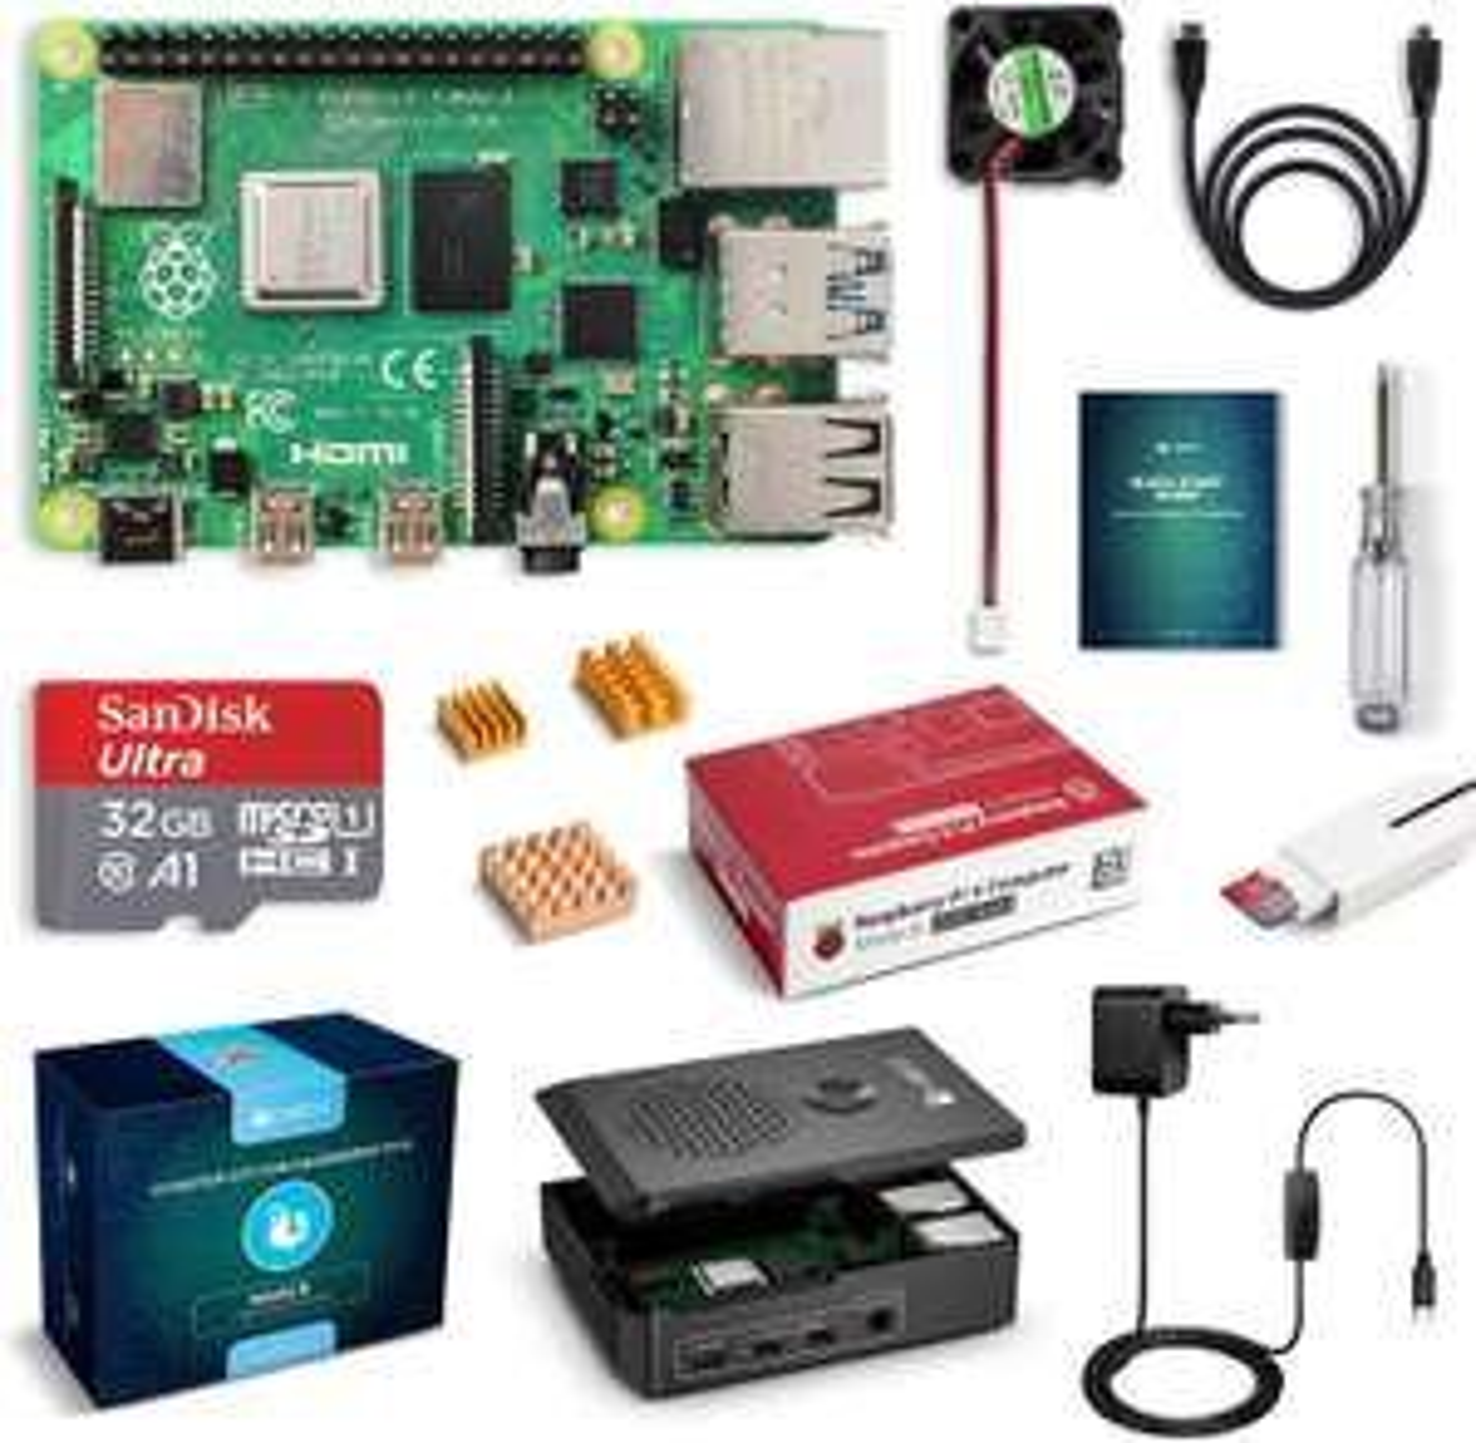 Raspberry Pi 4 Modell B 2GB Ultimatives Kit